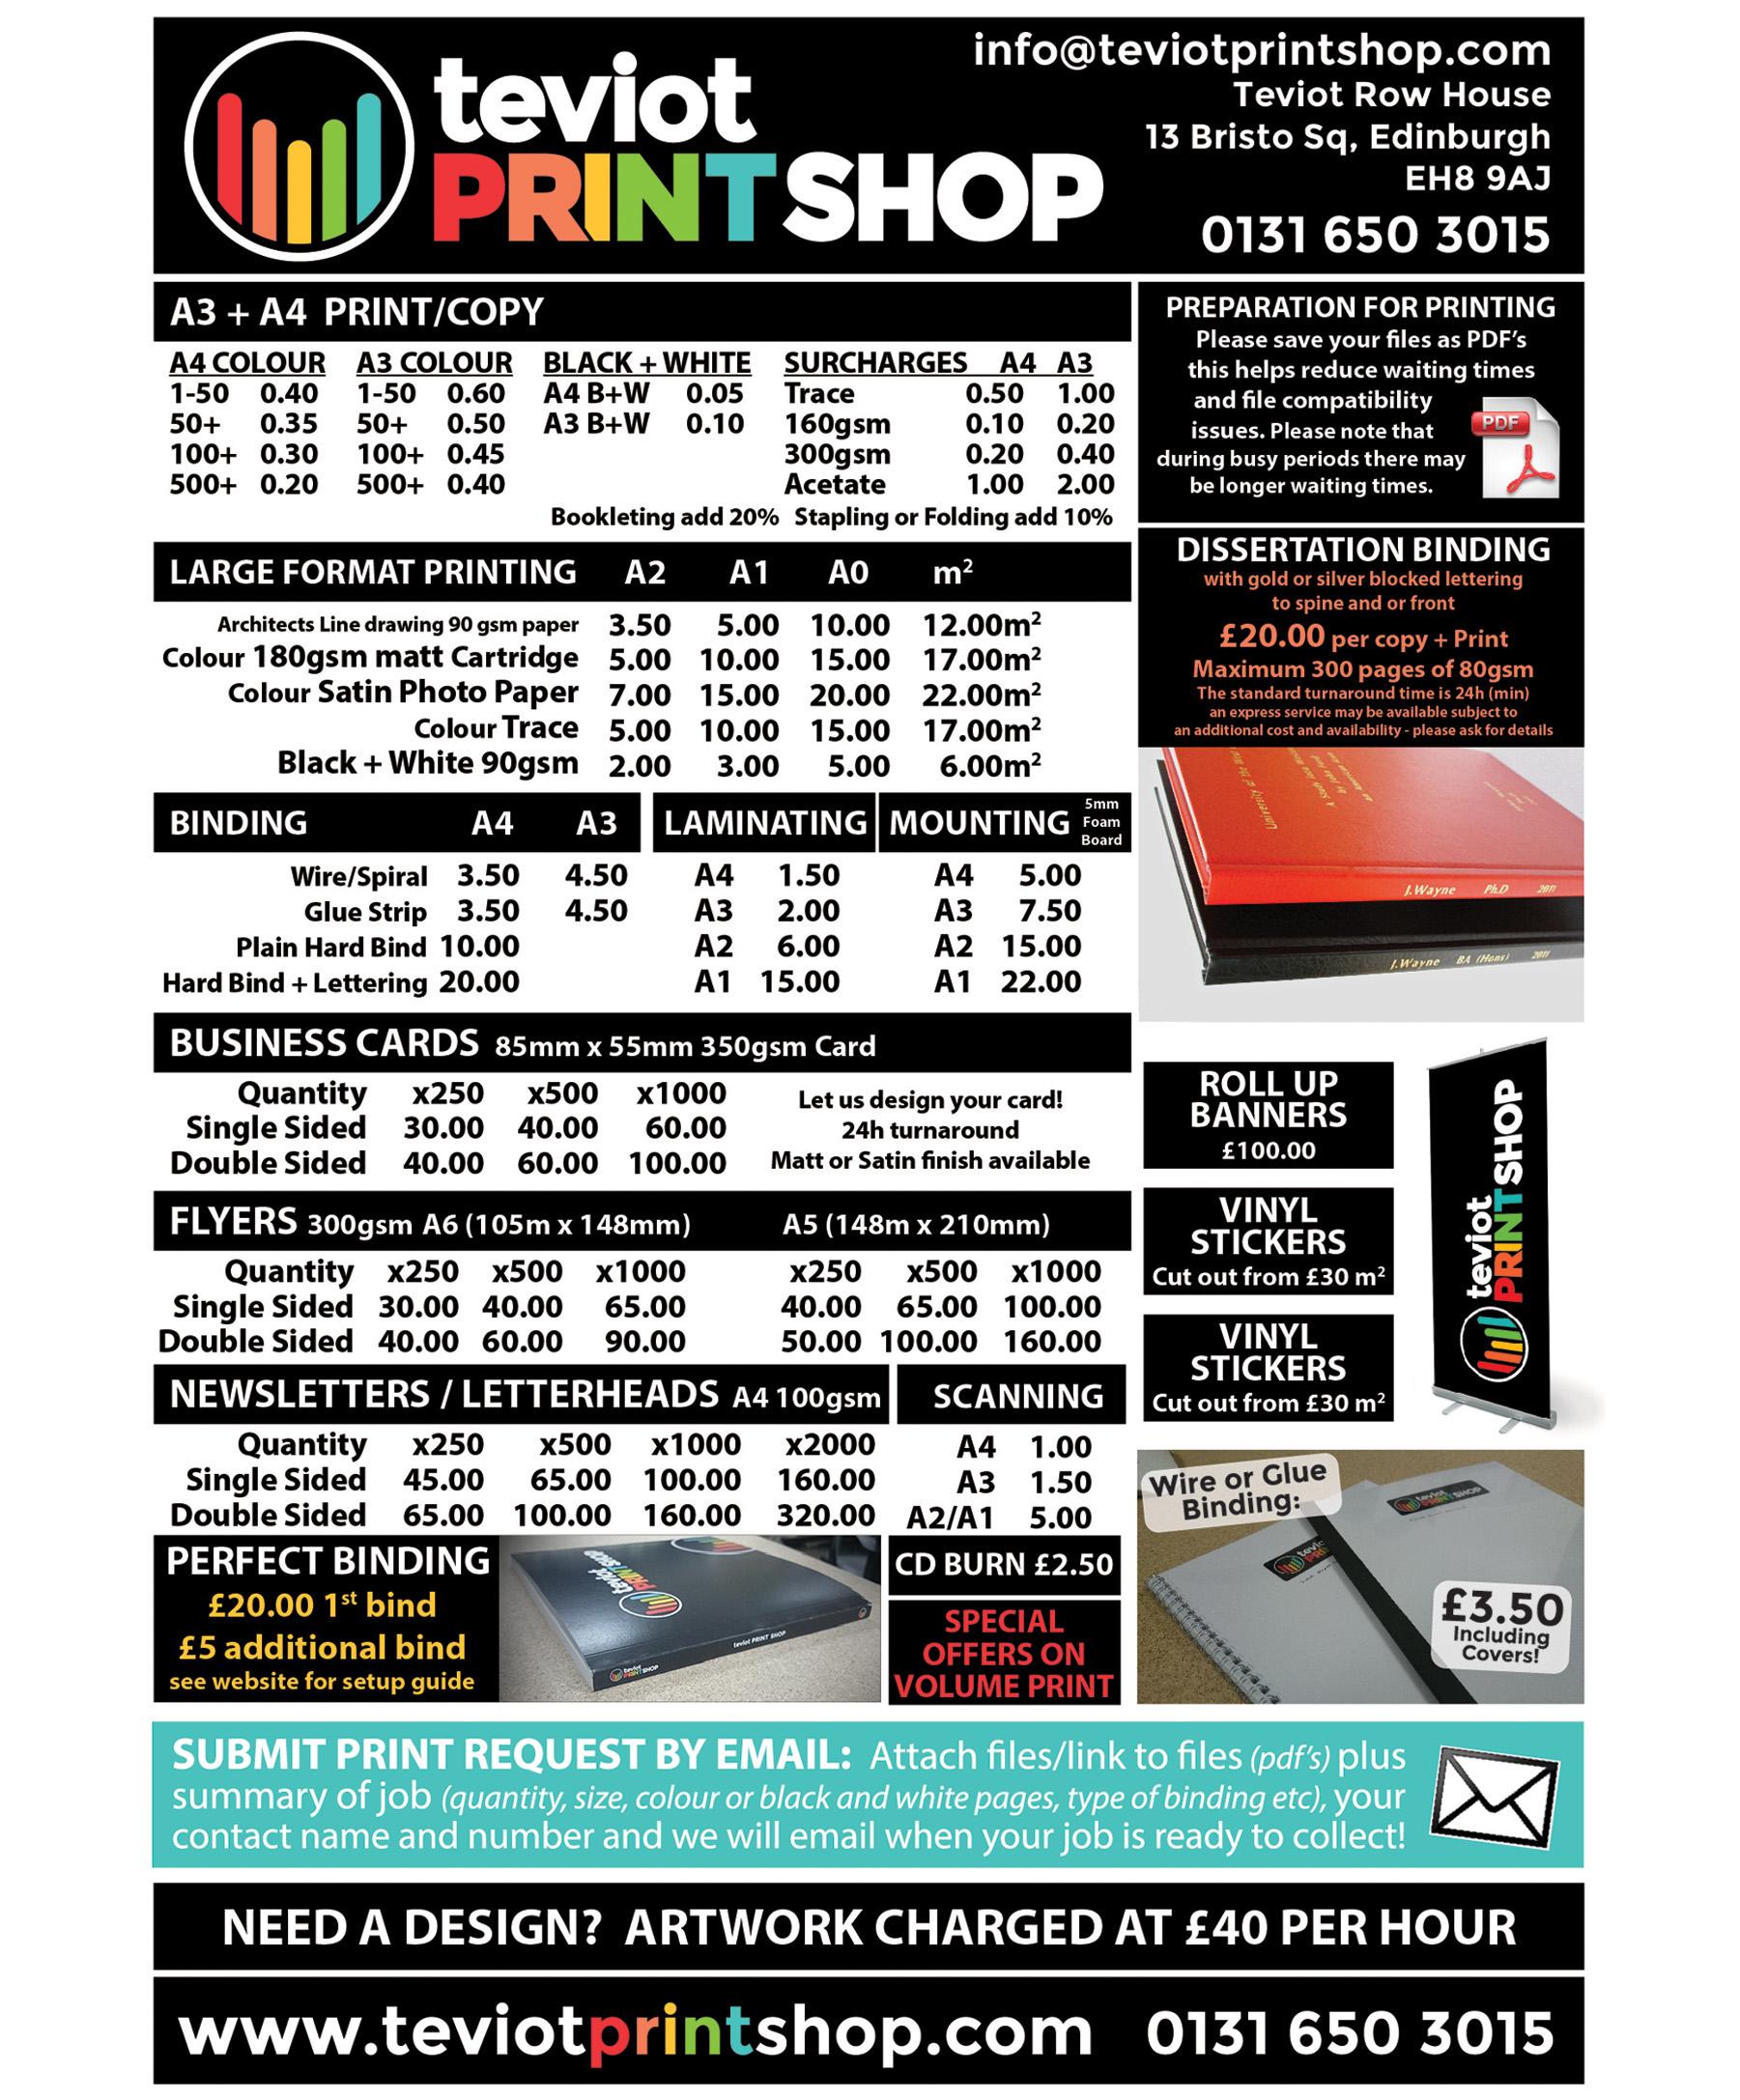 Teviot Print Shop – Price List